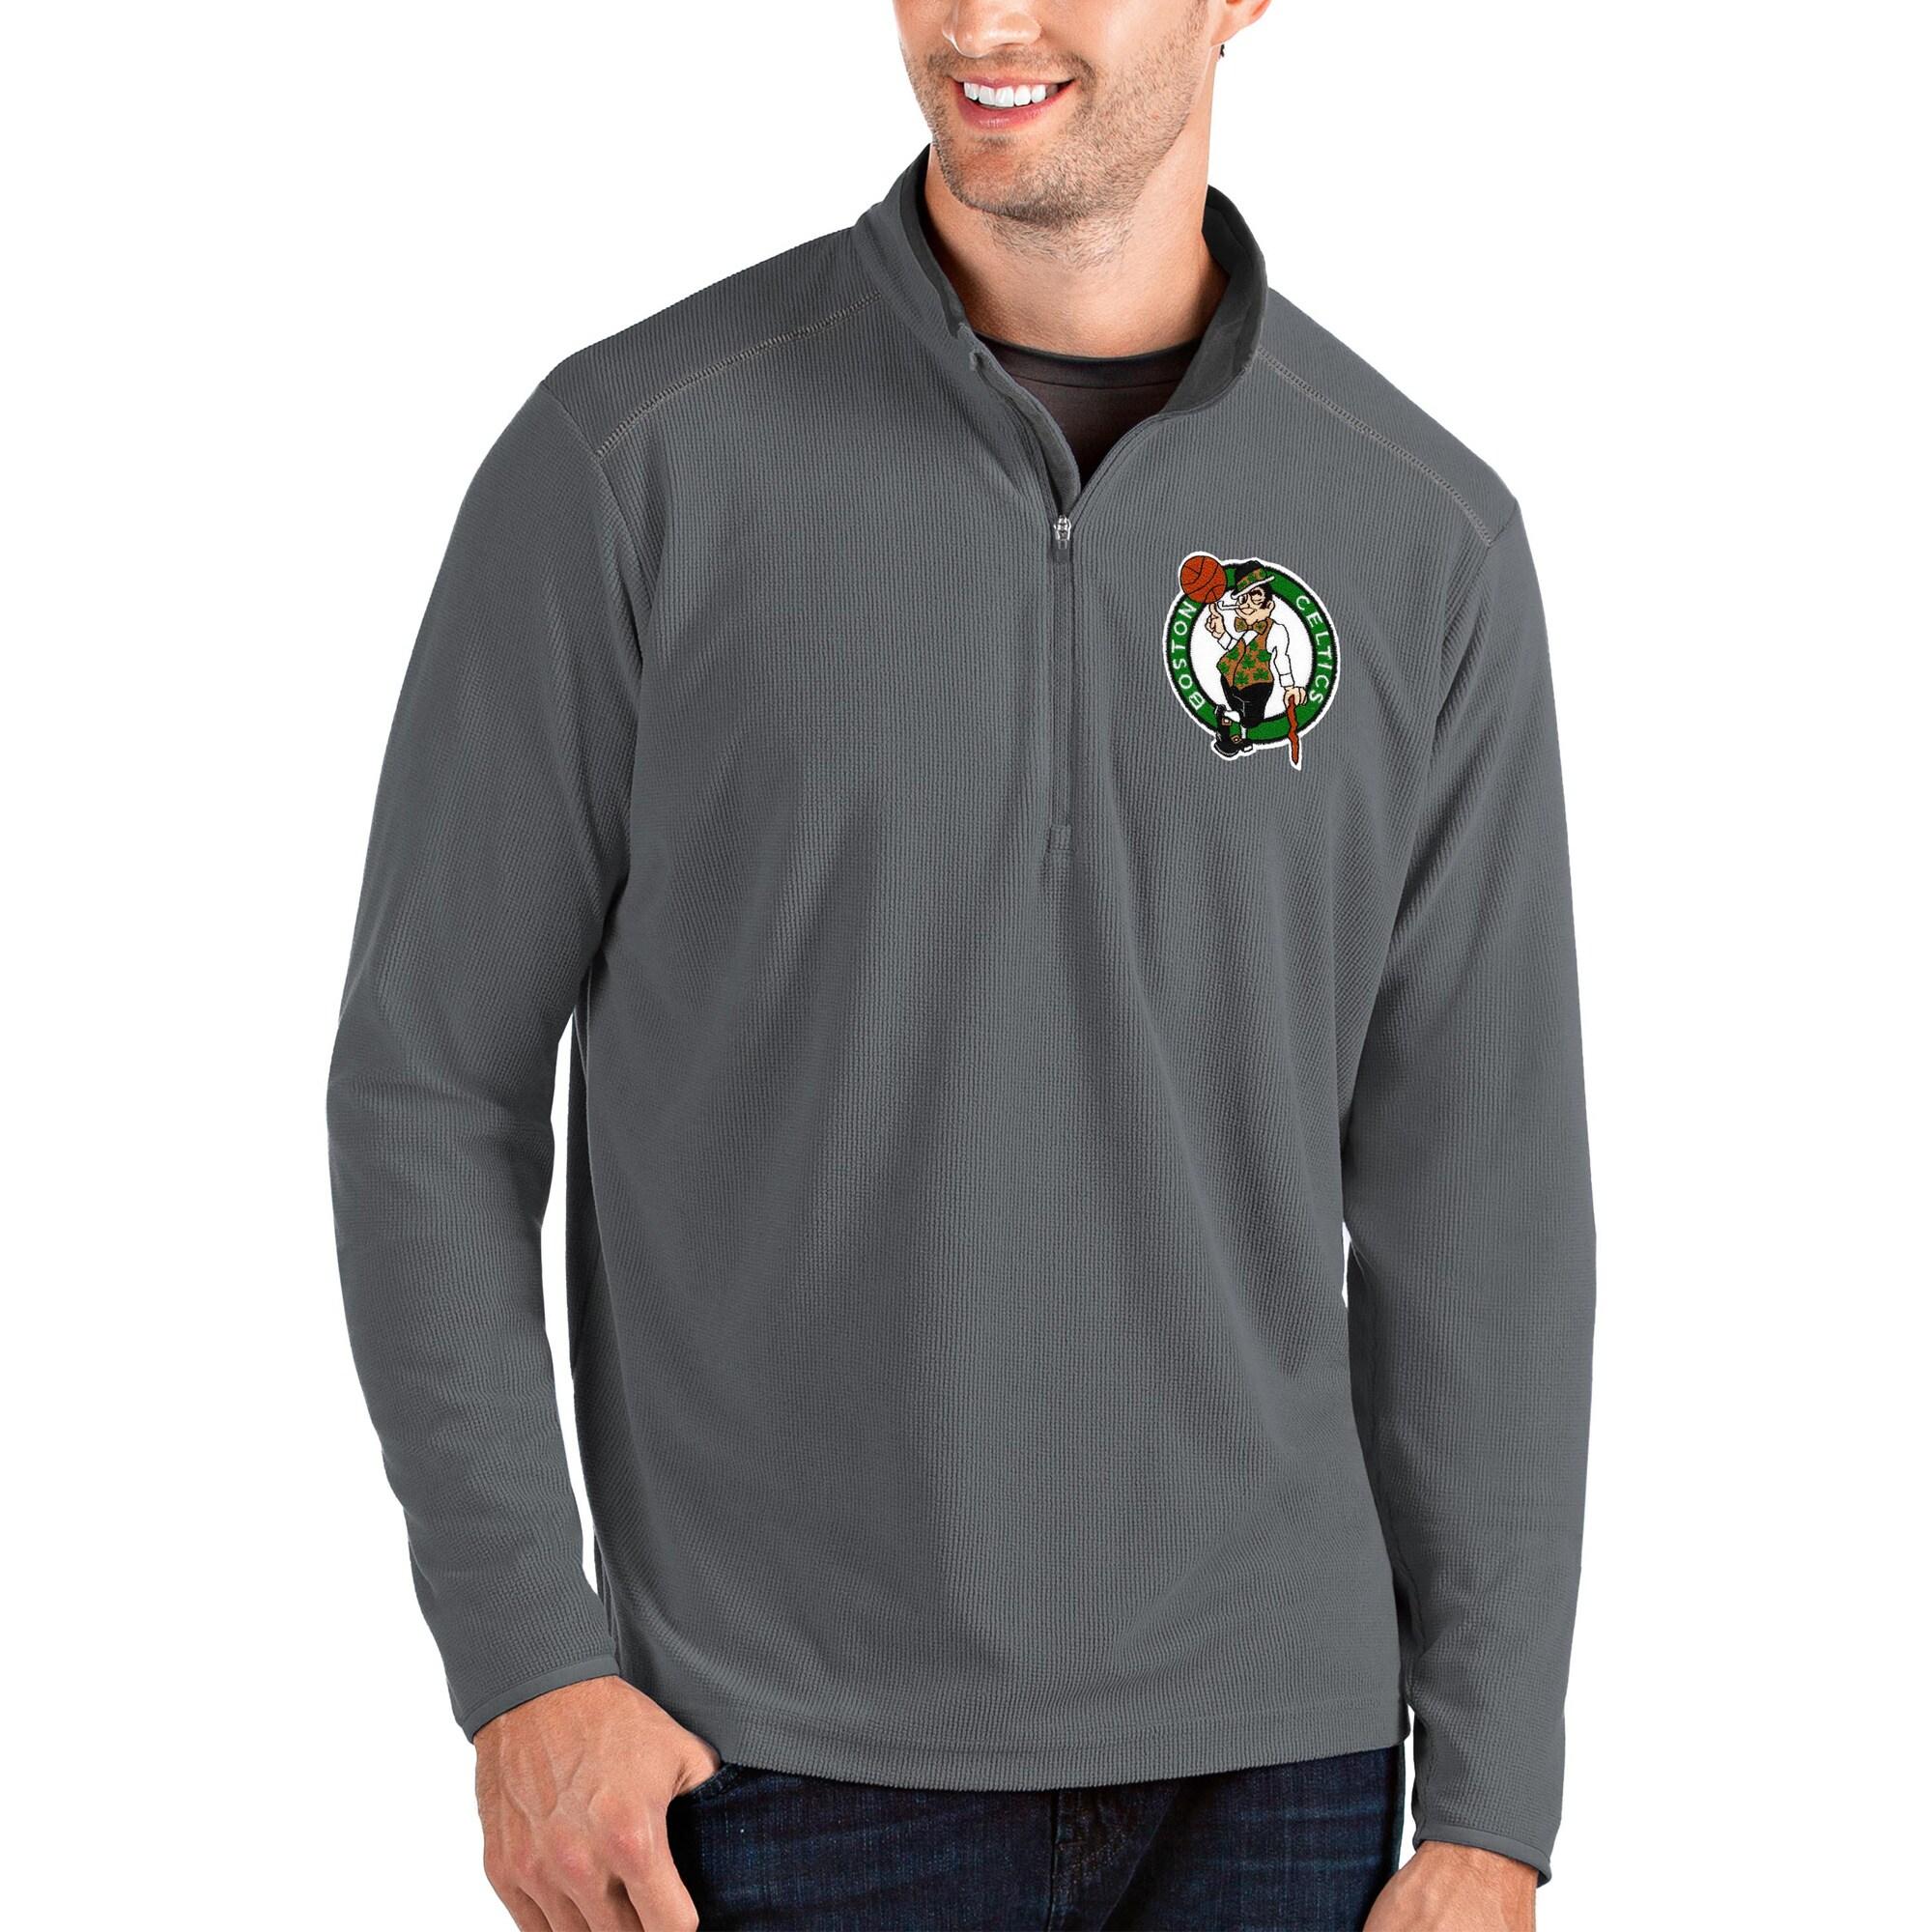 Boston Celtics Antigua Glacier Quarter-Zip Pullover Jacket - Charcoal/Gray